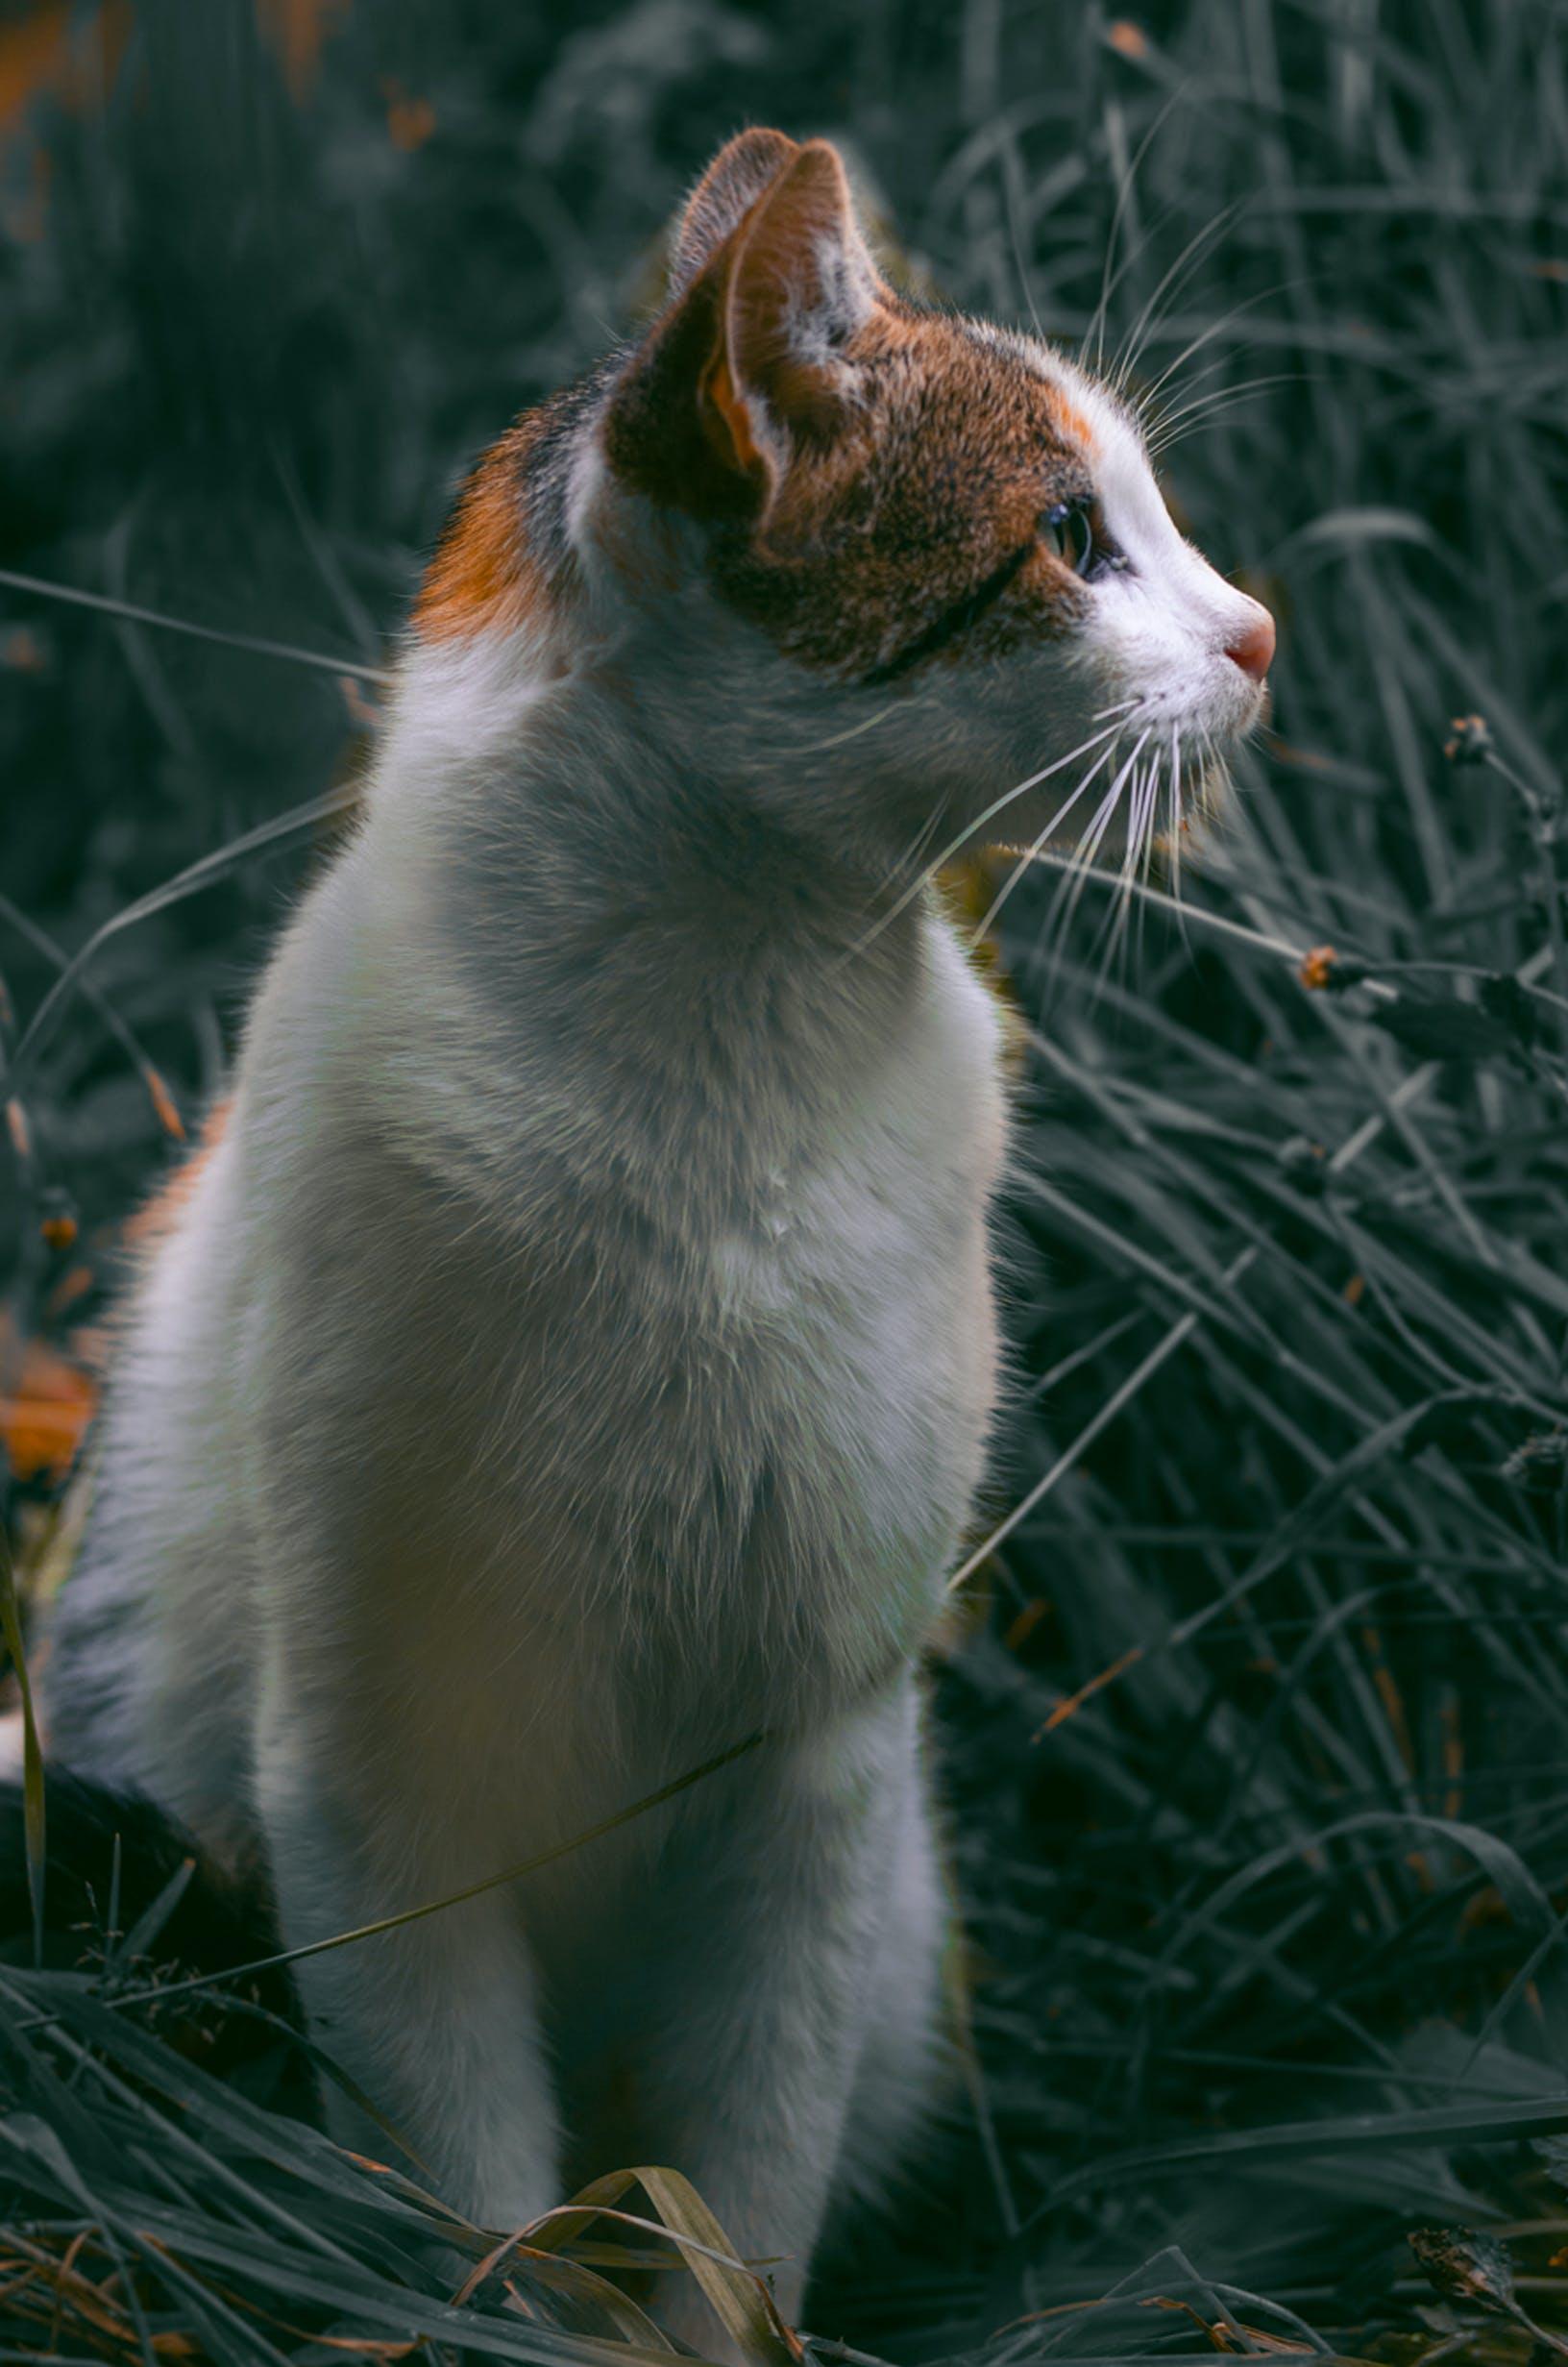 Cat Looking Towards Right